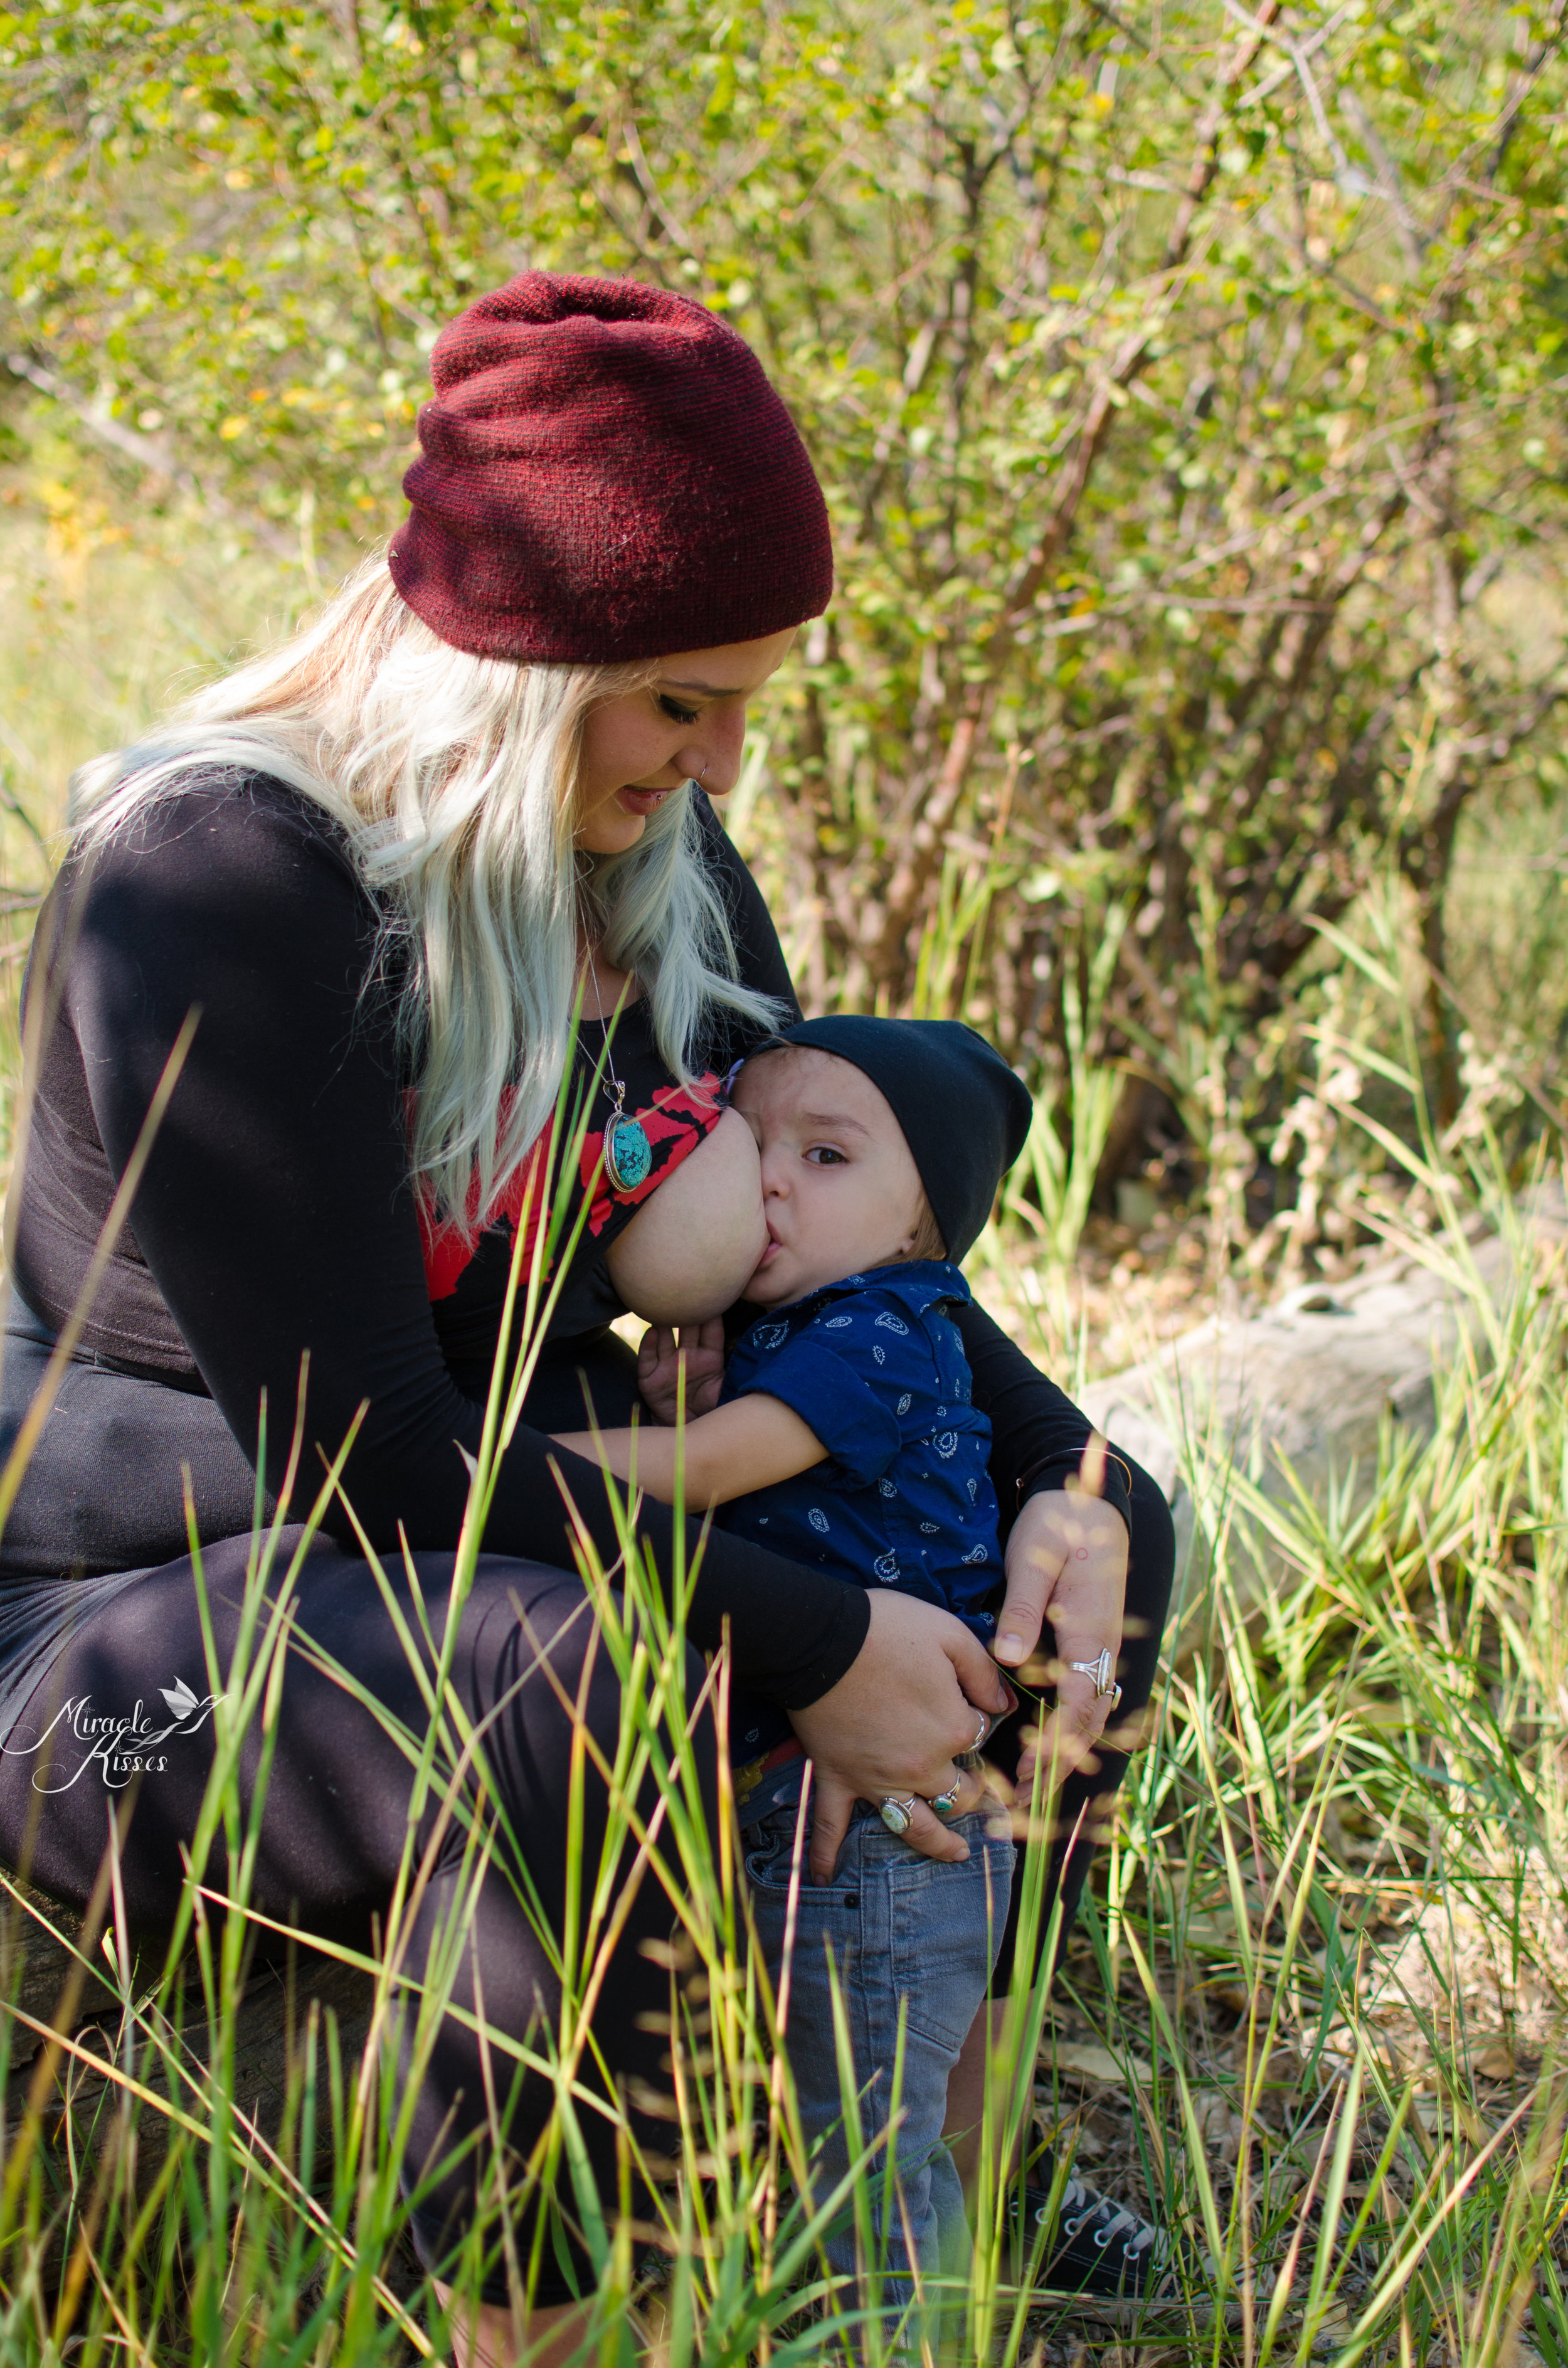 breastfeeding in public, extended breastfeeding, motherhood